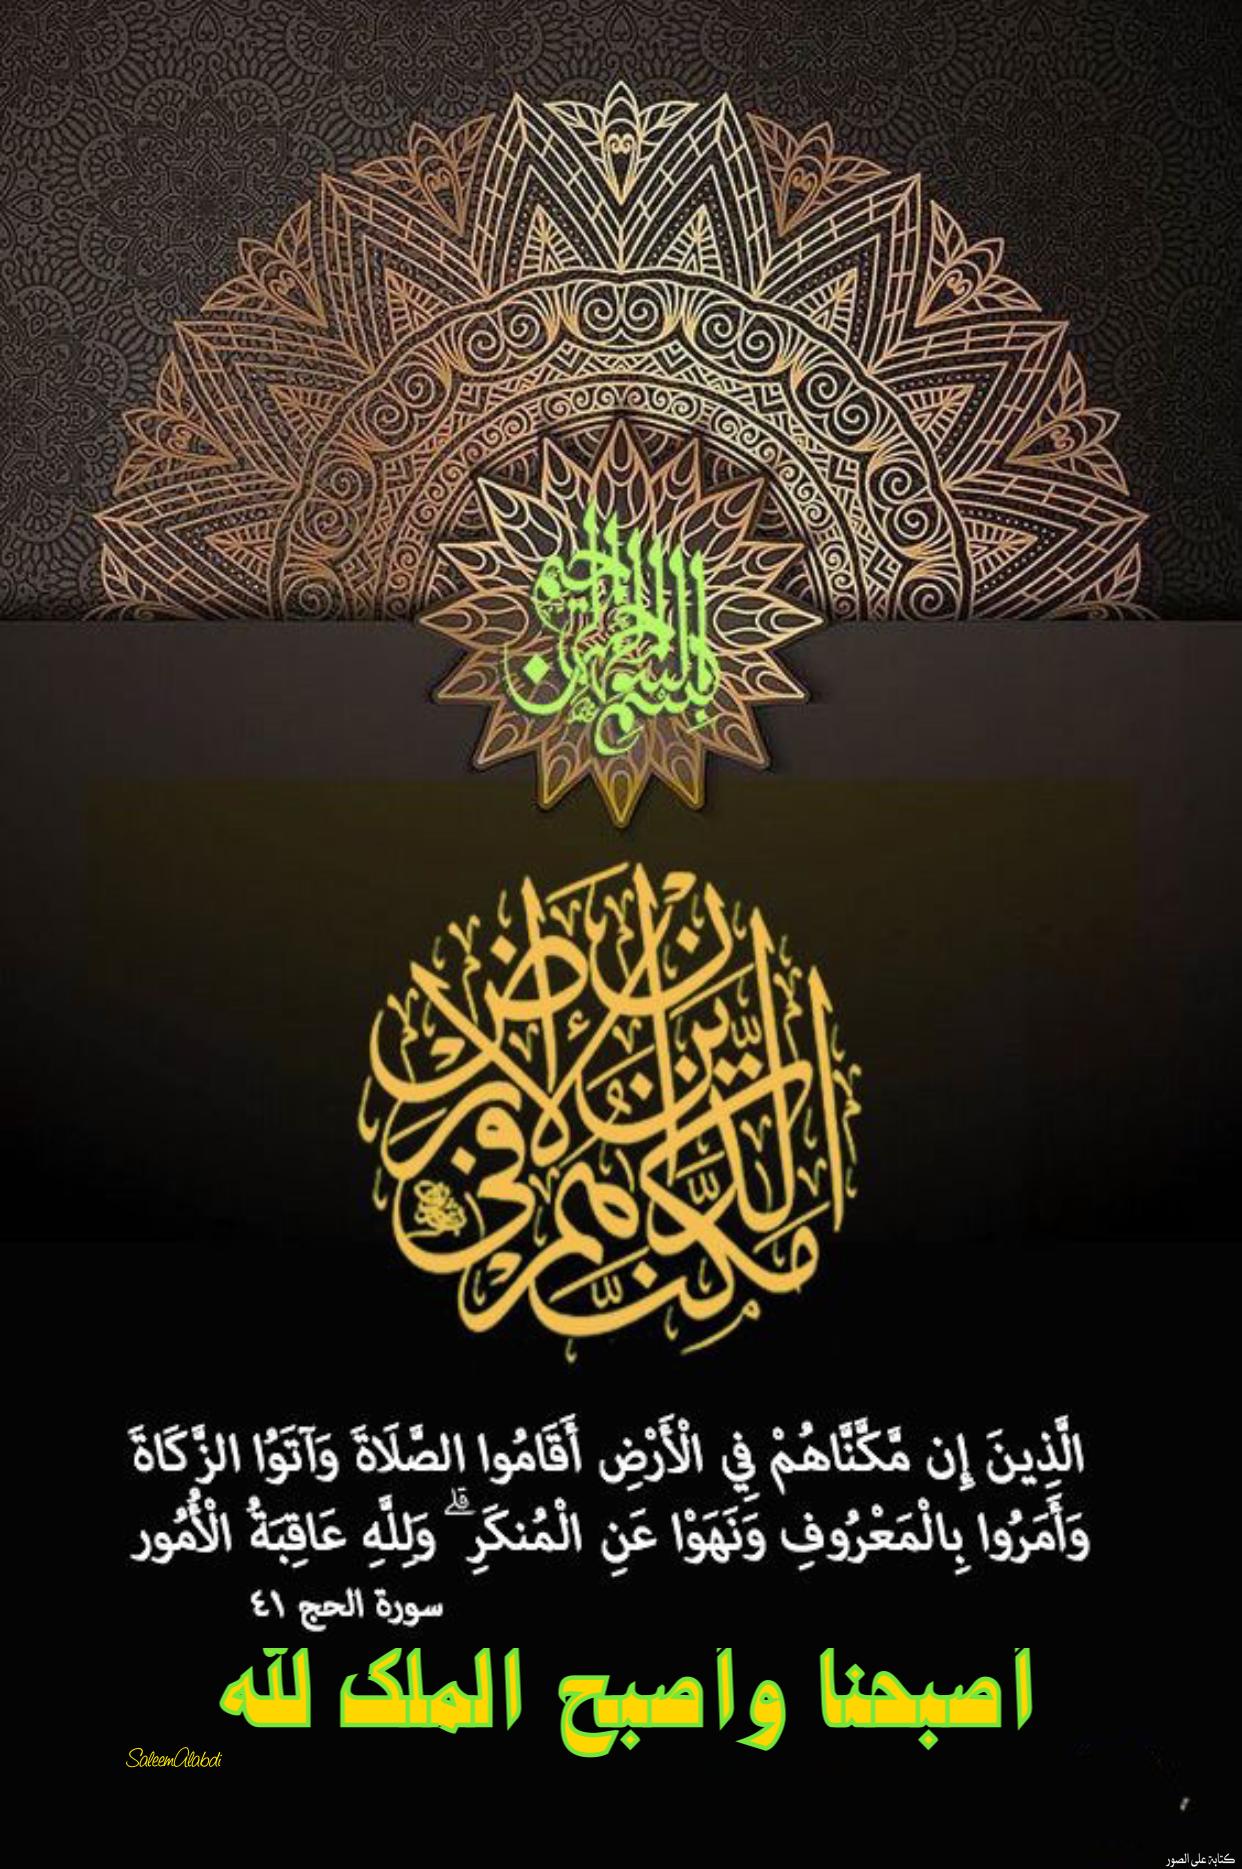 Pin By Sam On صباح الخير Islamic Calligraphy Painting Islamic Art Calligraphy Islamic Caligraphy